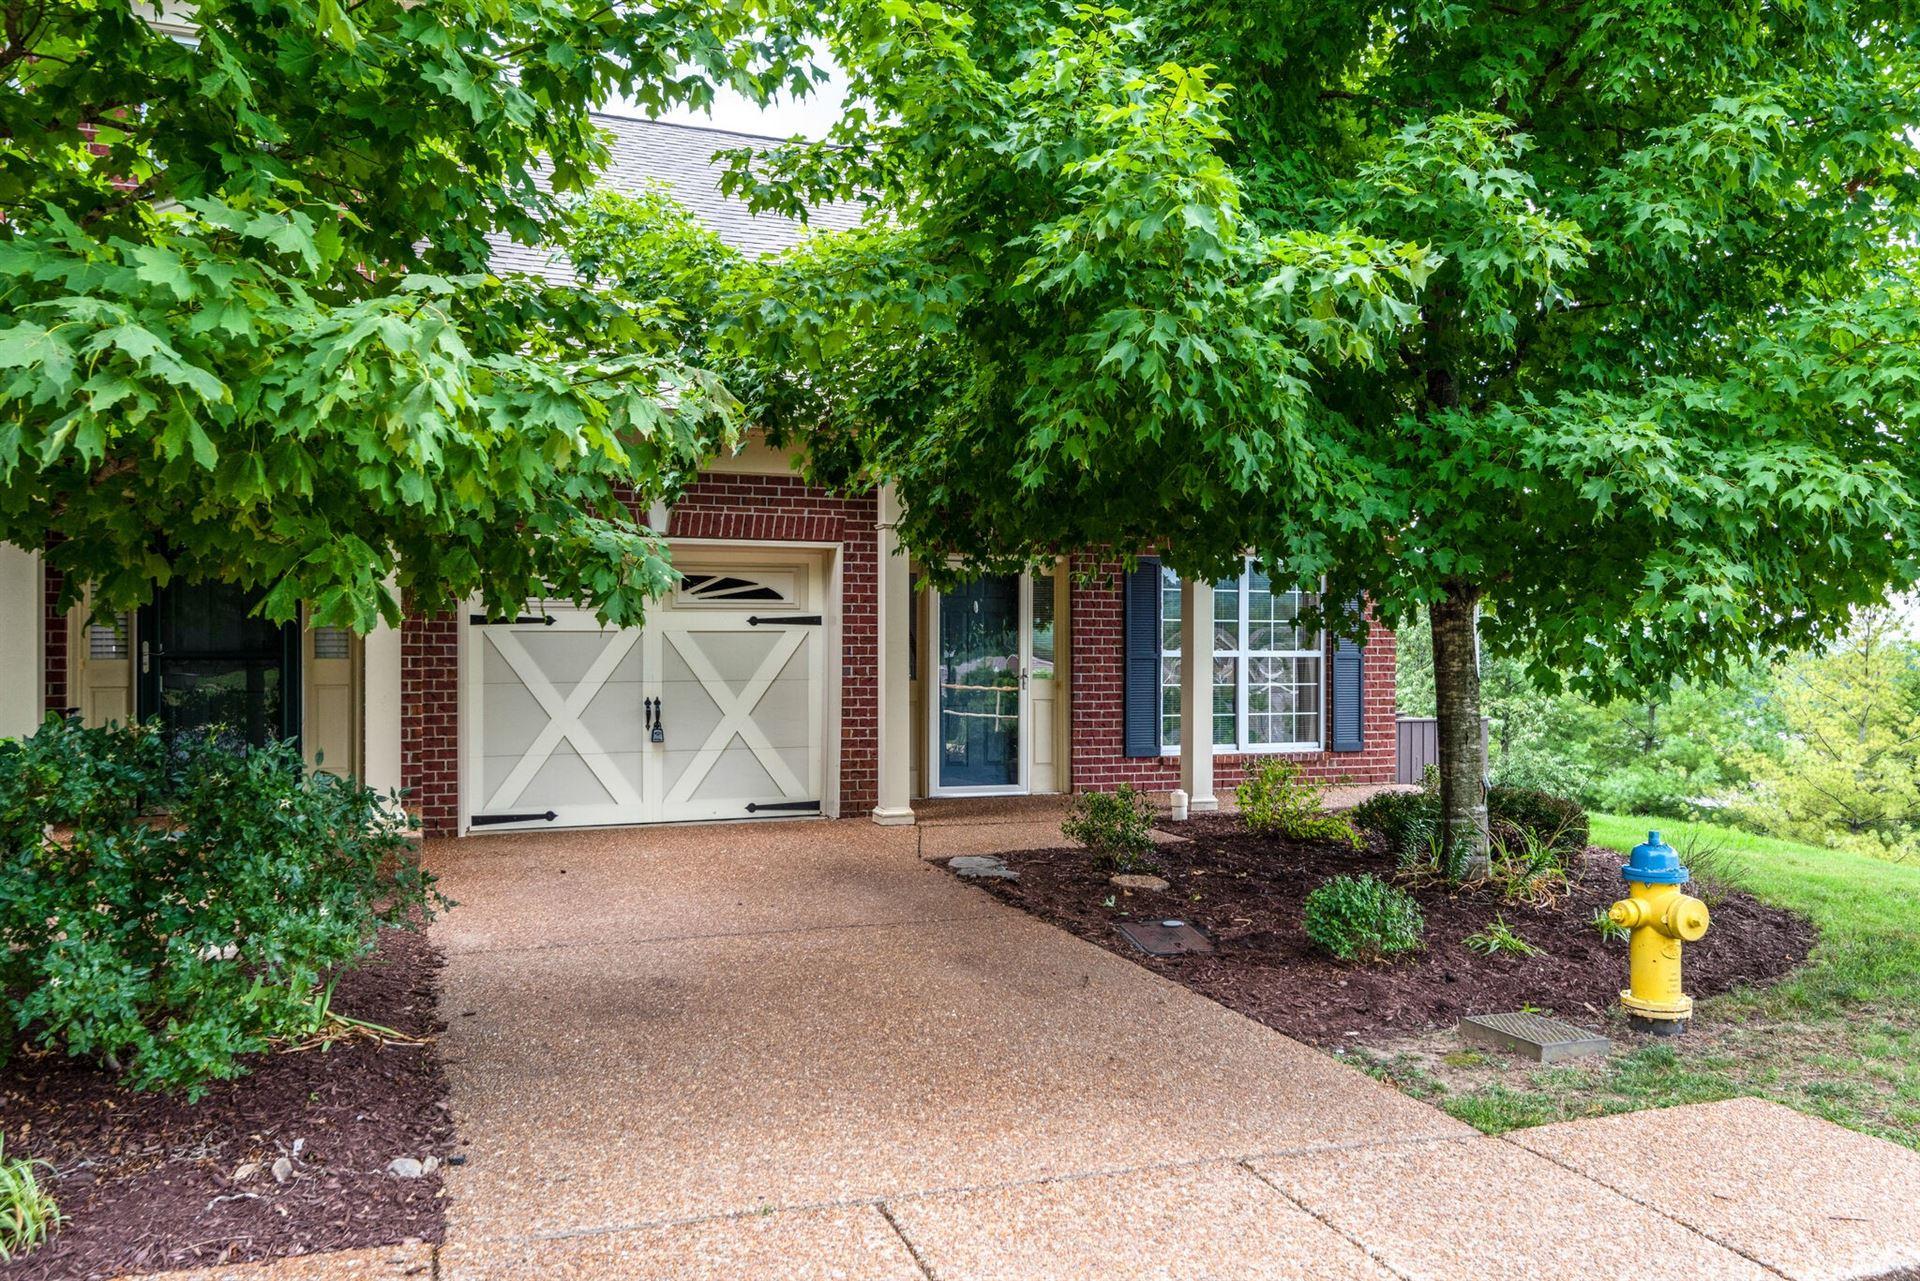 1813 Brentwood Pointe, Franklin, TN 37067 - MLS#: 2275050